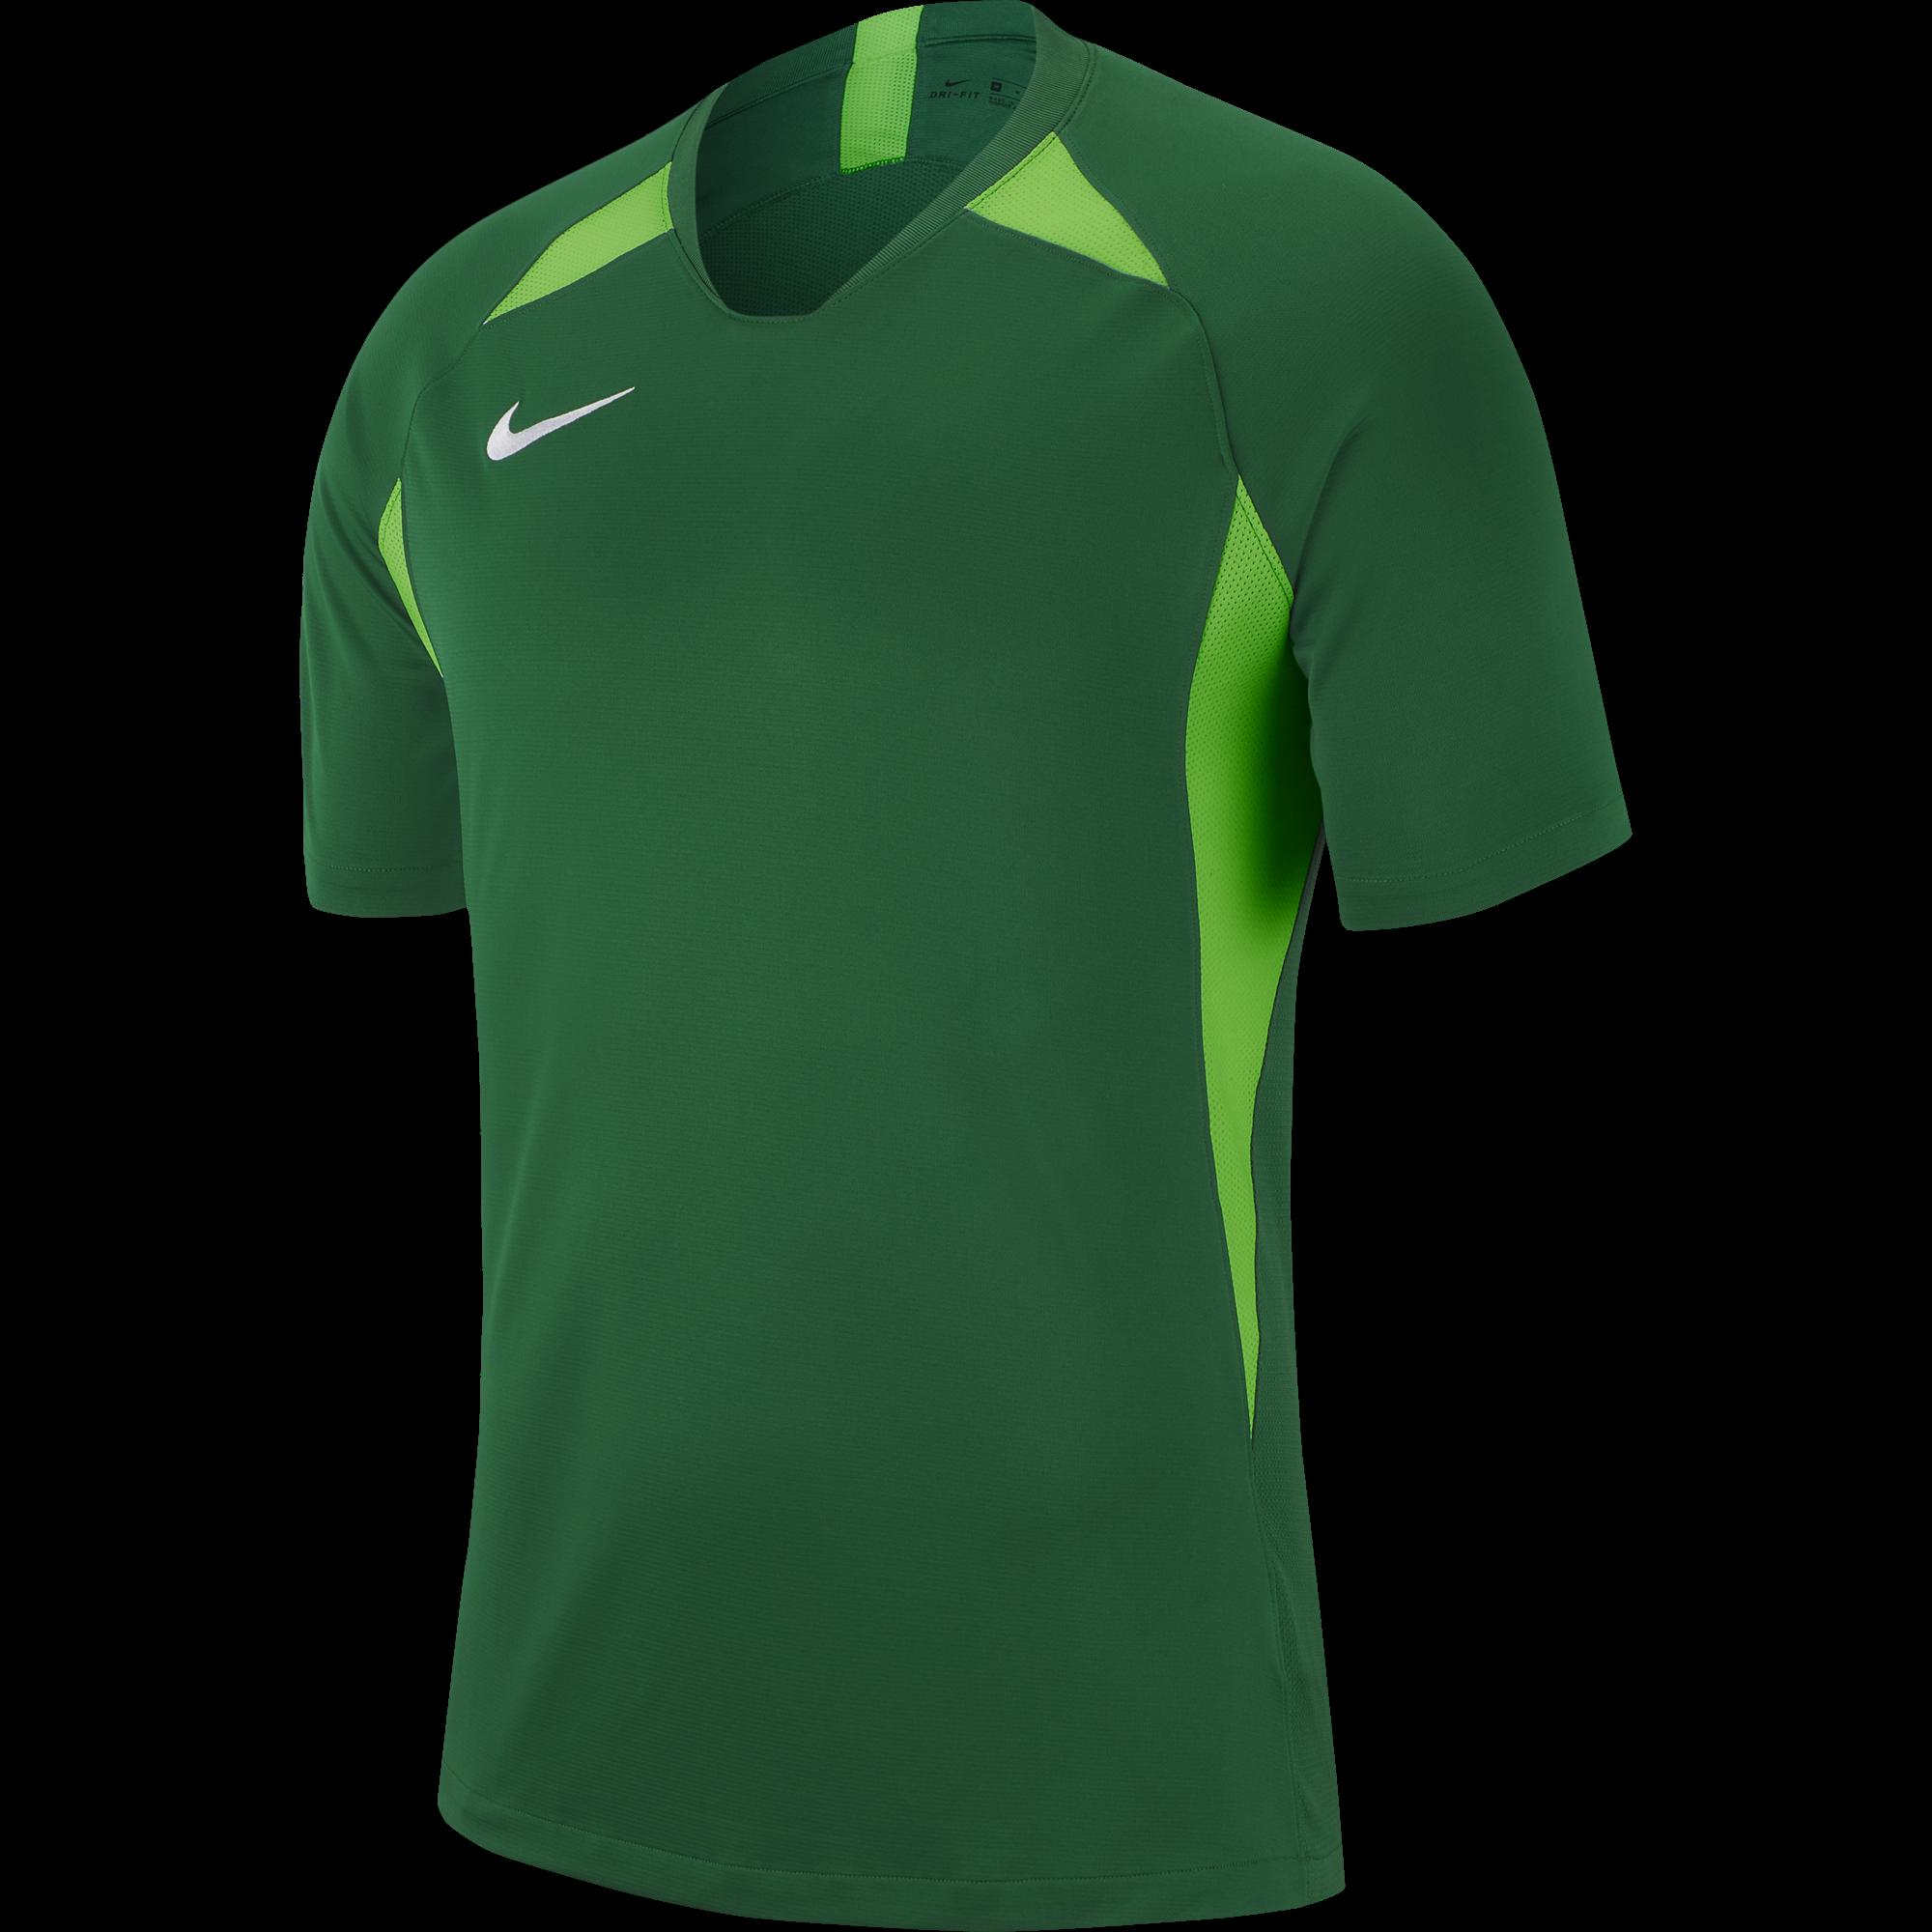 Nike Legend jersey (pine green/action green)